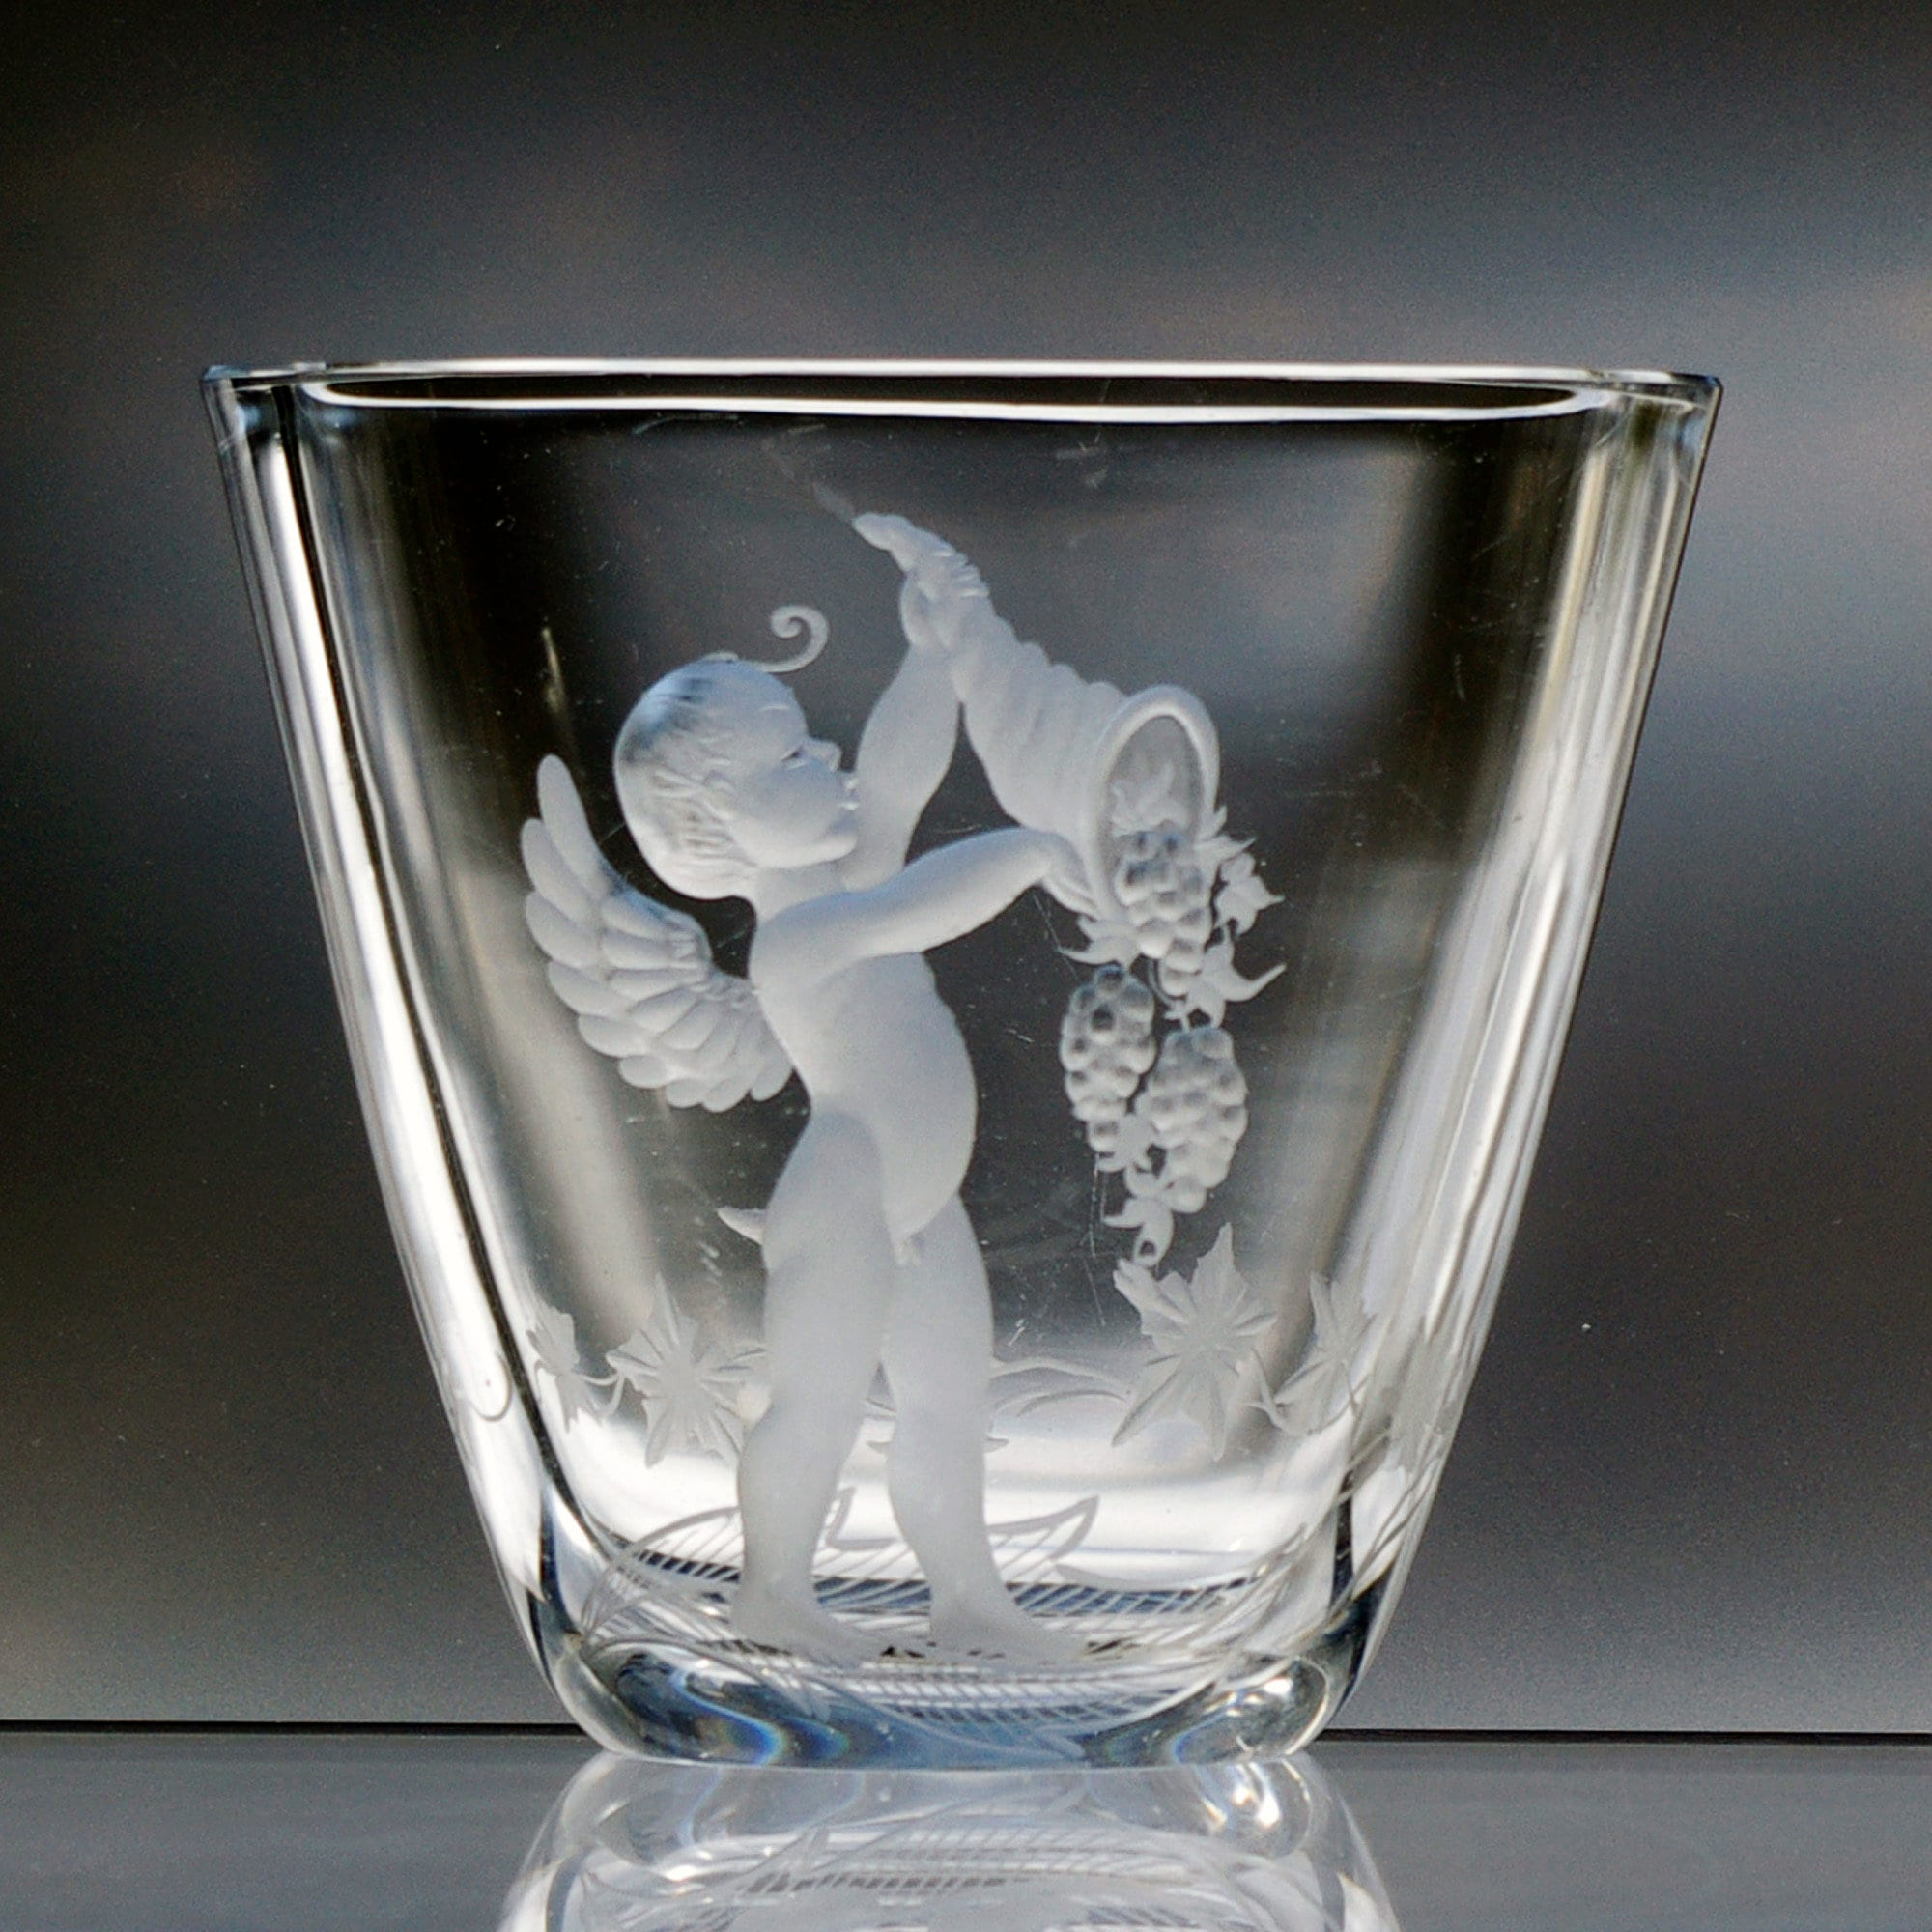 Naked Cherub / Cupid, 5 Engraved Swedish Crystal Vase